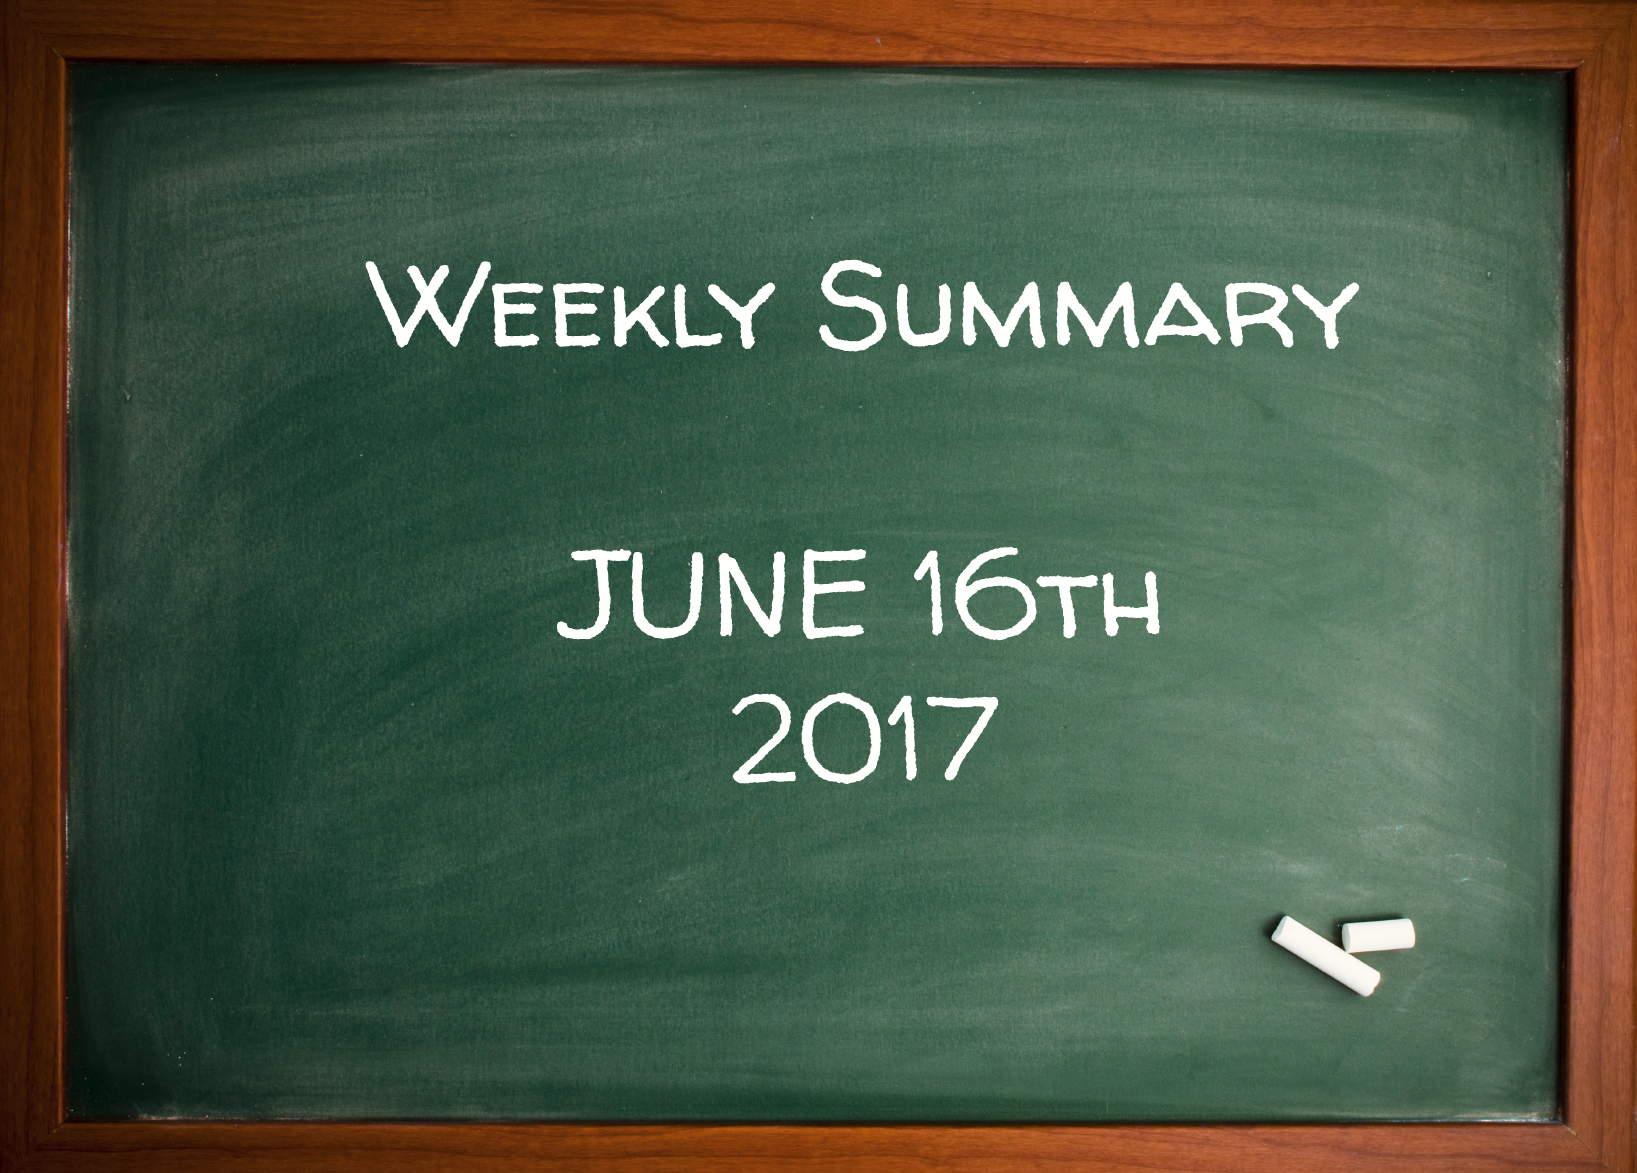 Weekly Summary June 16th 2017 - Vladimir Ribakov